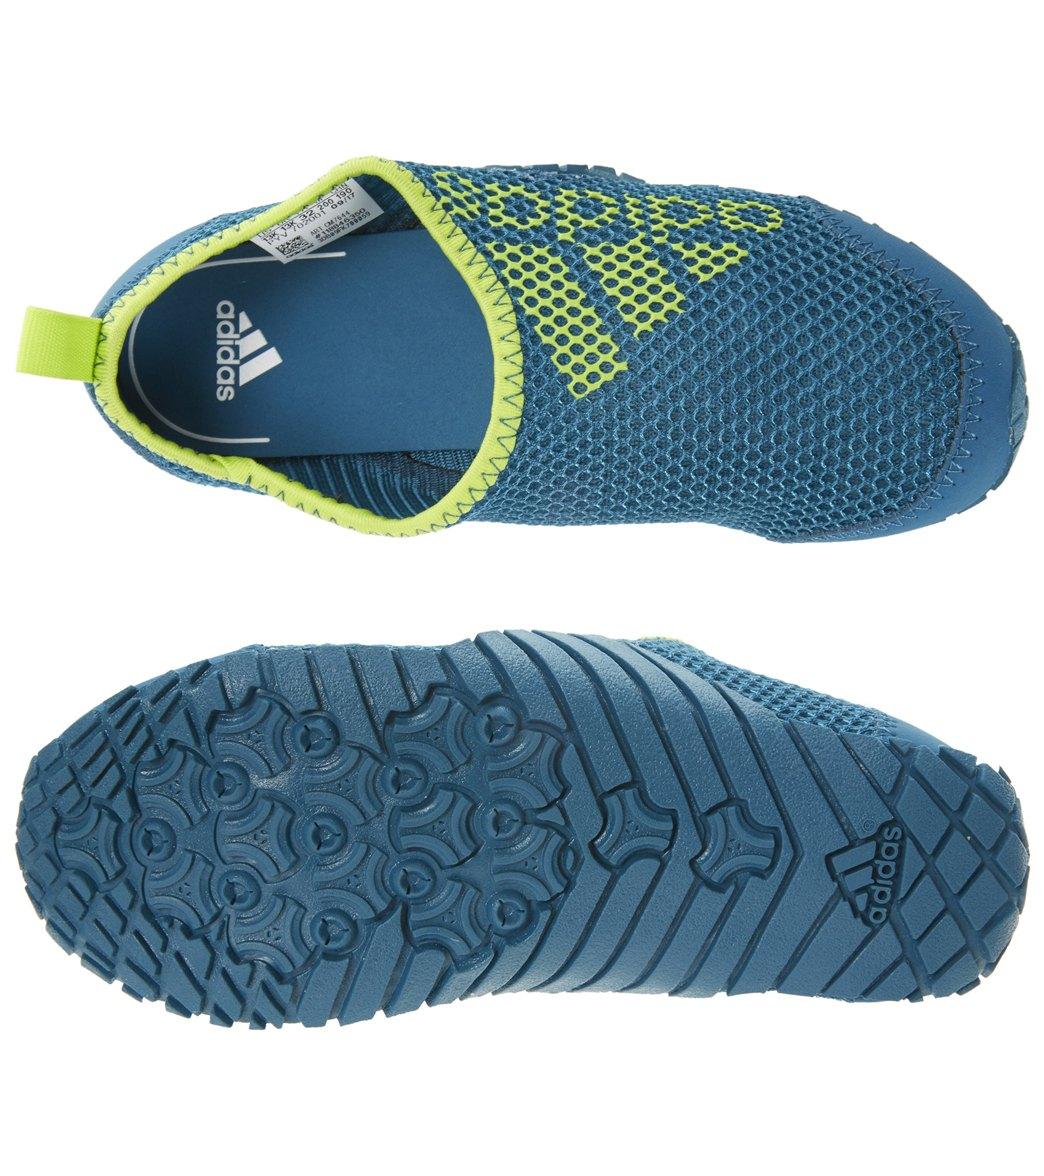 80e2cd454 Adidas Kids  Kurobe Water Shoes at SwimOutlet.com